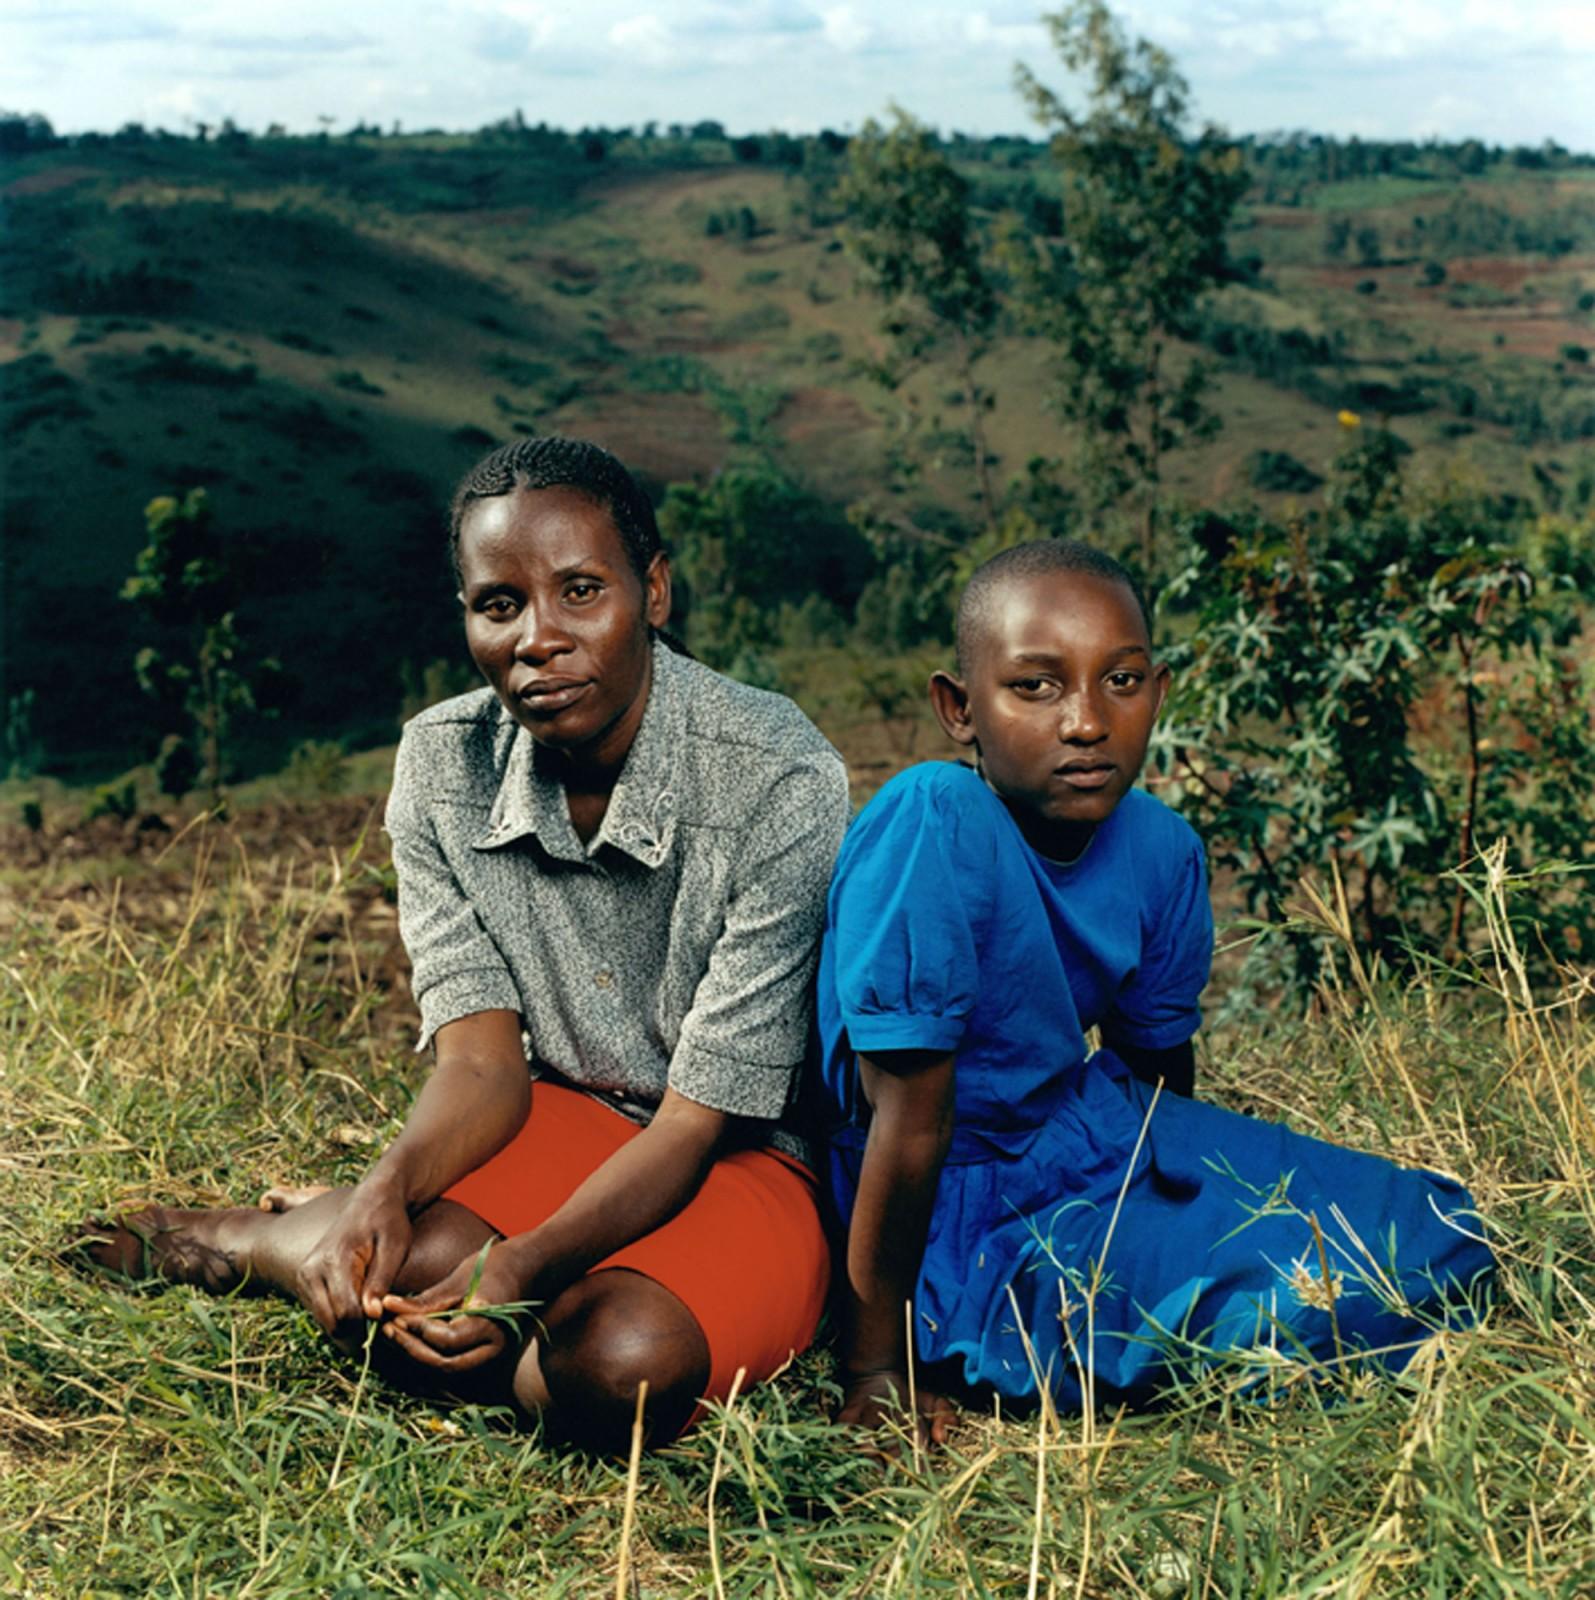 rencontres rwanda site de rencontre divorcés